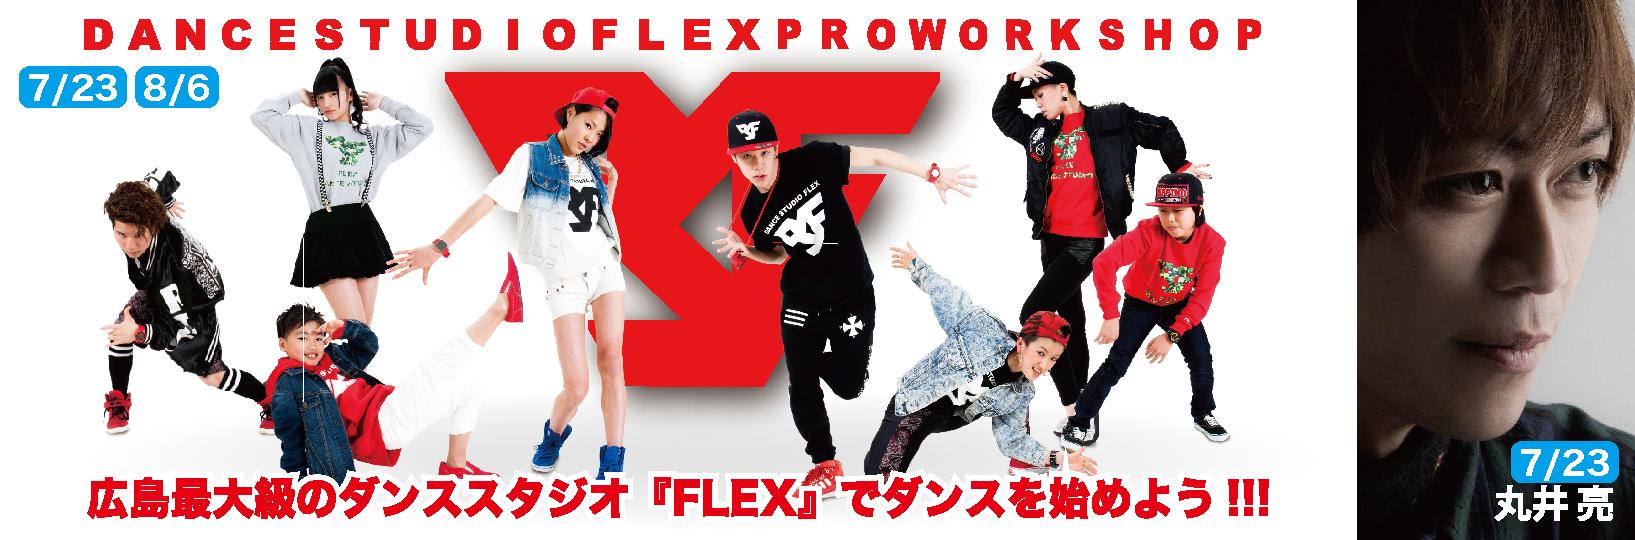 hp-flex-14